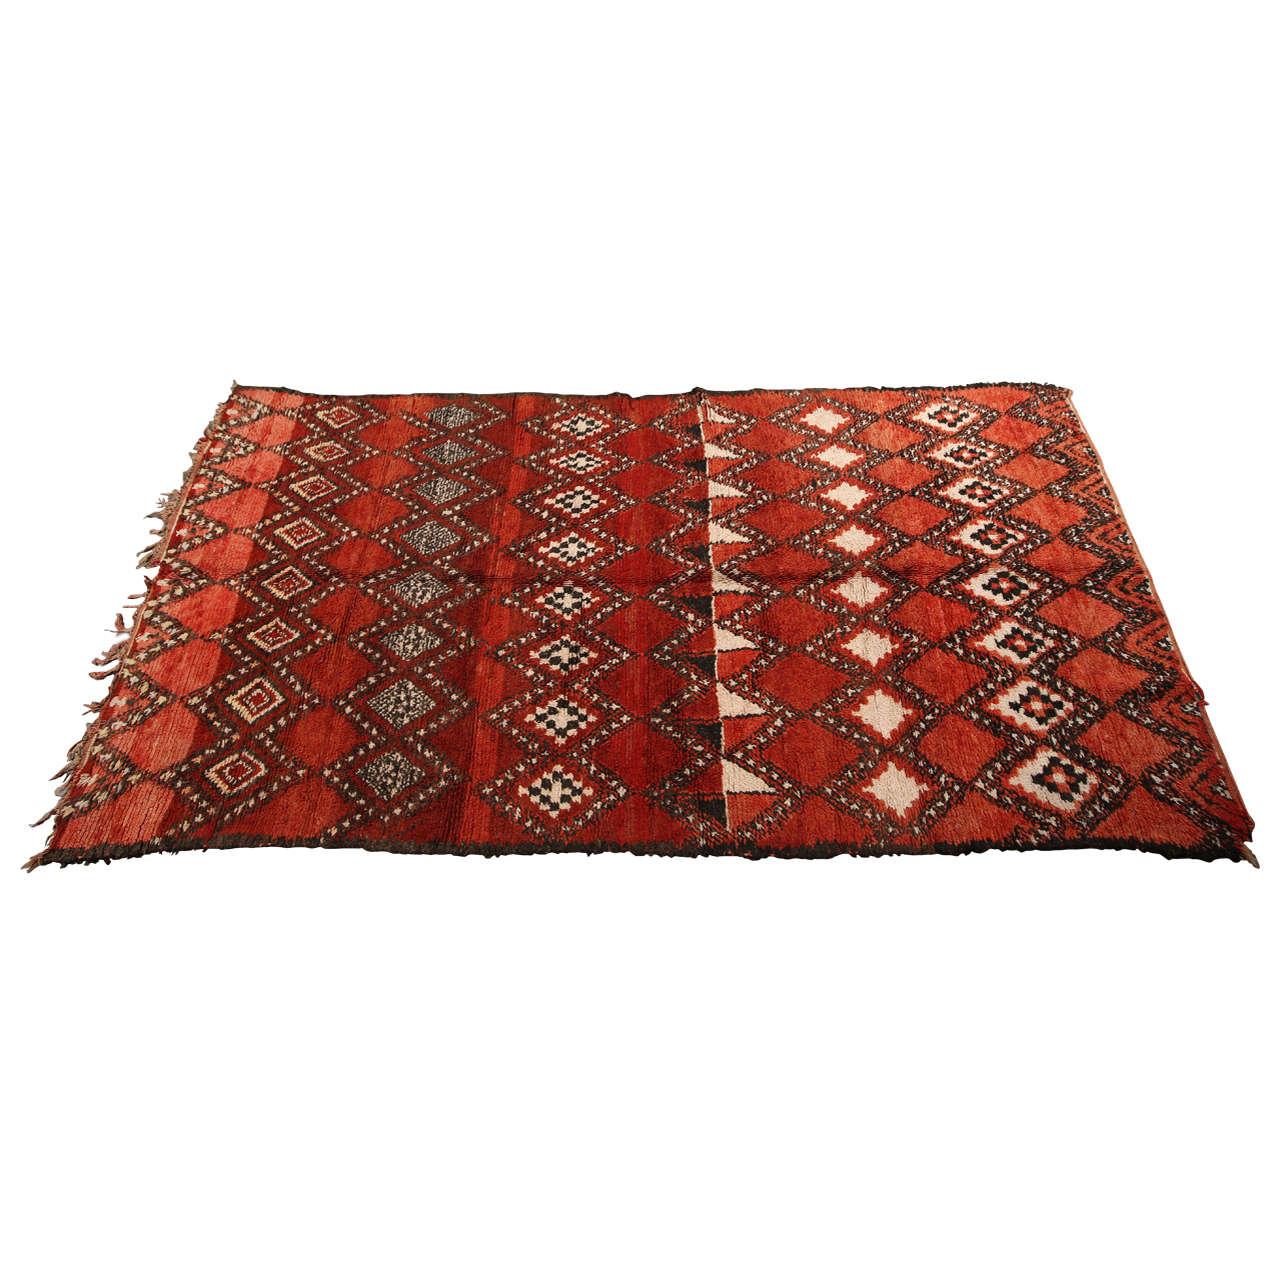 Maroc Tribal Rug: Vintage Moroccan Red Tribal Rug At 1stdibs